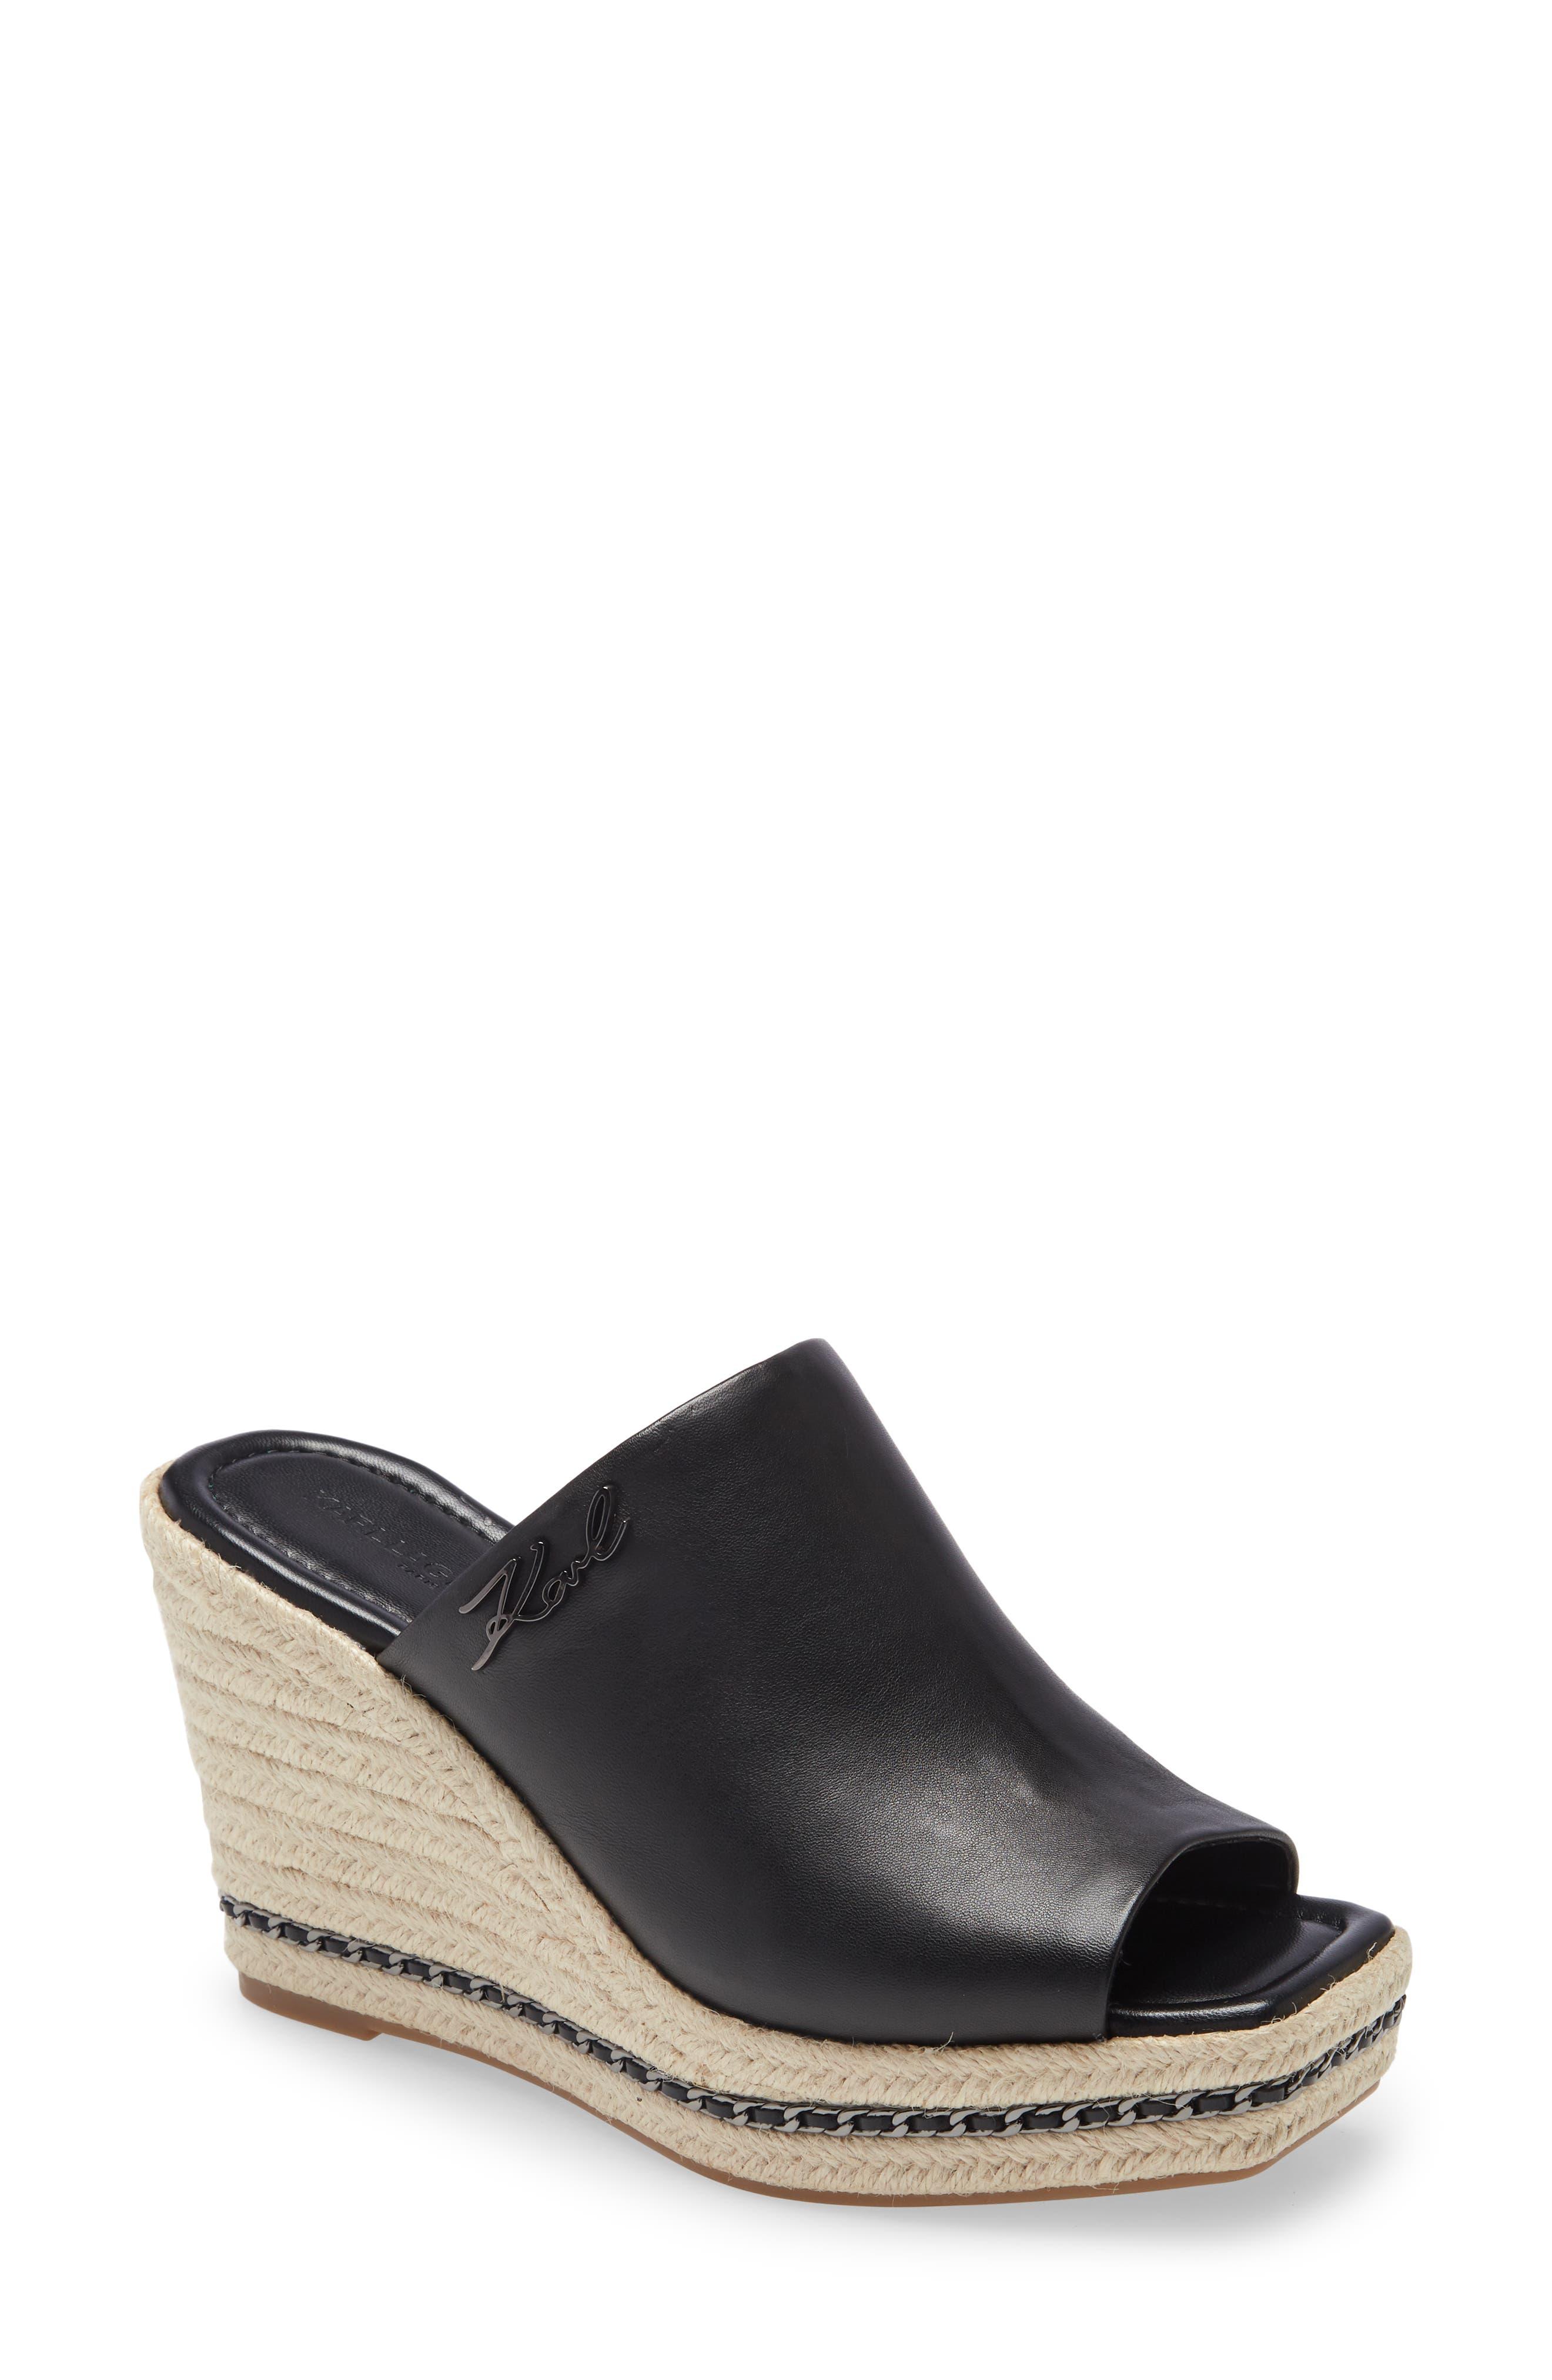 Espadrille Wedge Sandal